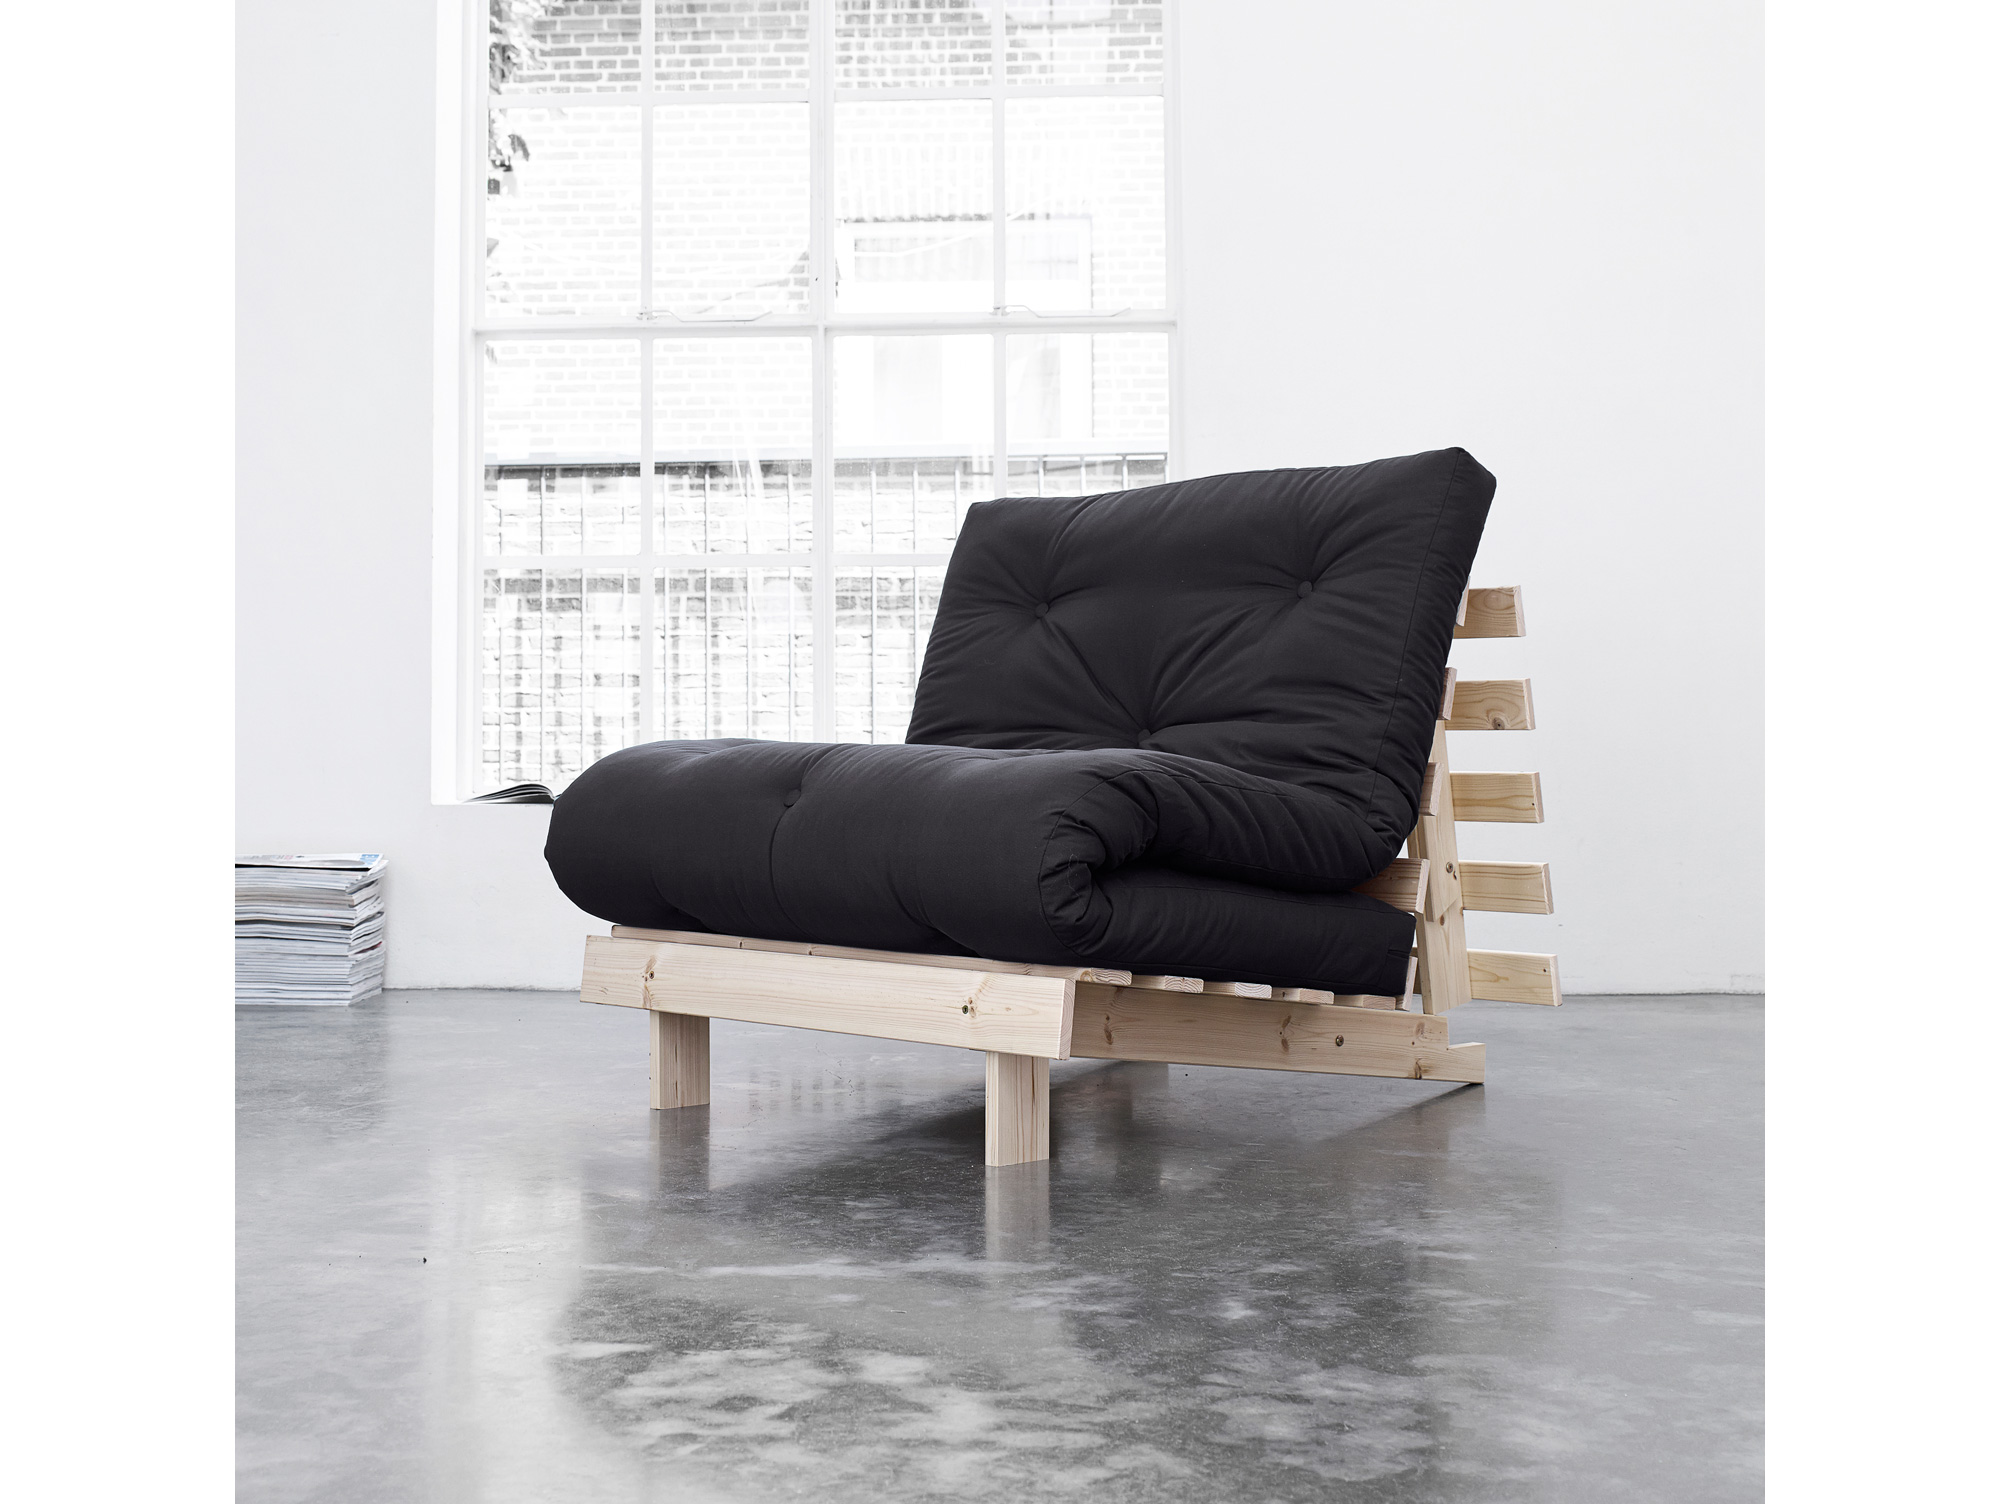 Großartig Büromöbel Rostock Galerie - Die Kinderzimmer Design Ideen ...